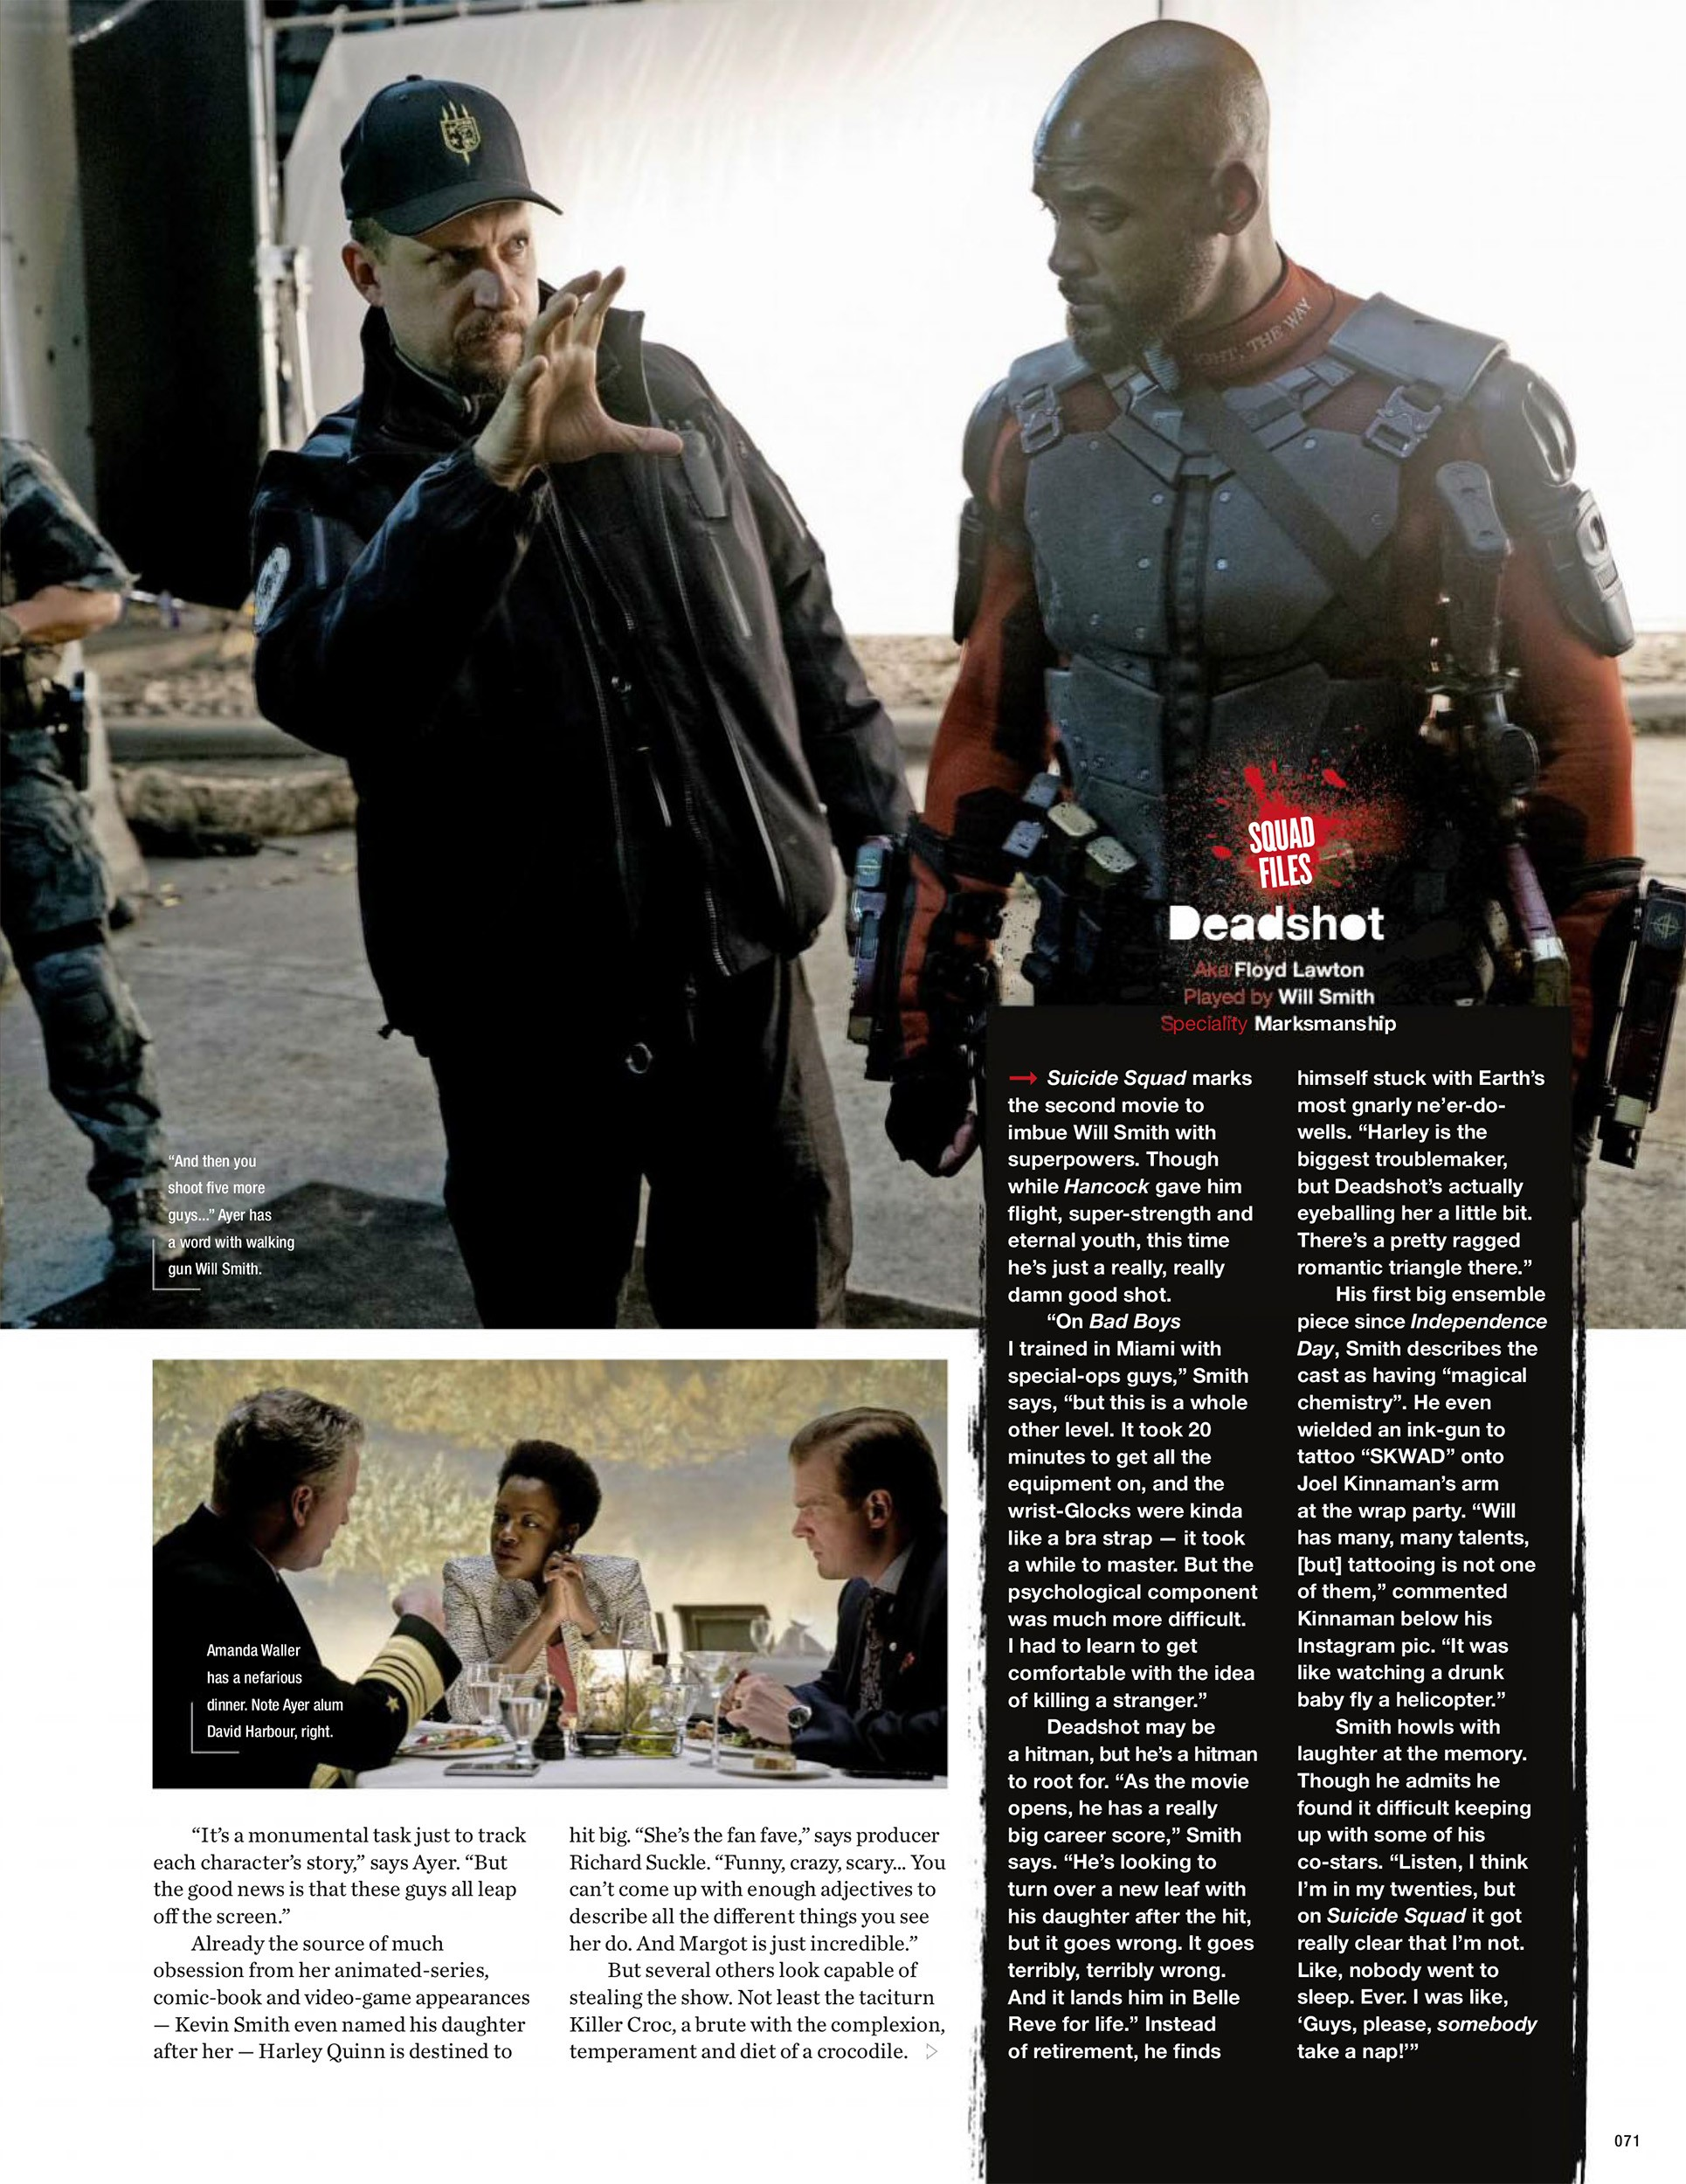 Suicide Squad Article in Empire Magazine [6]